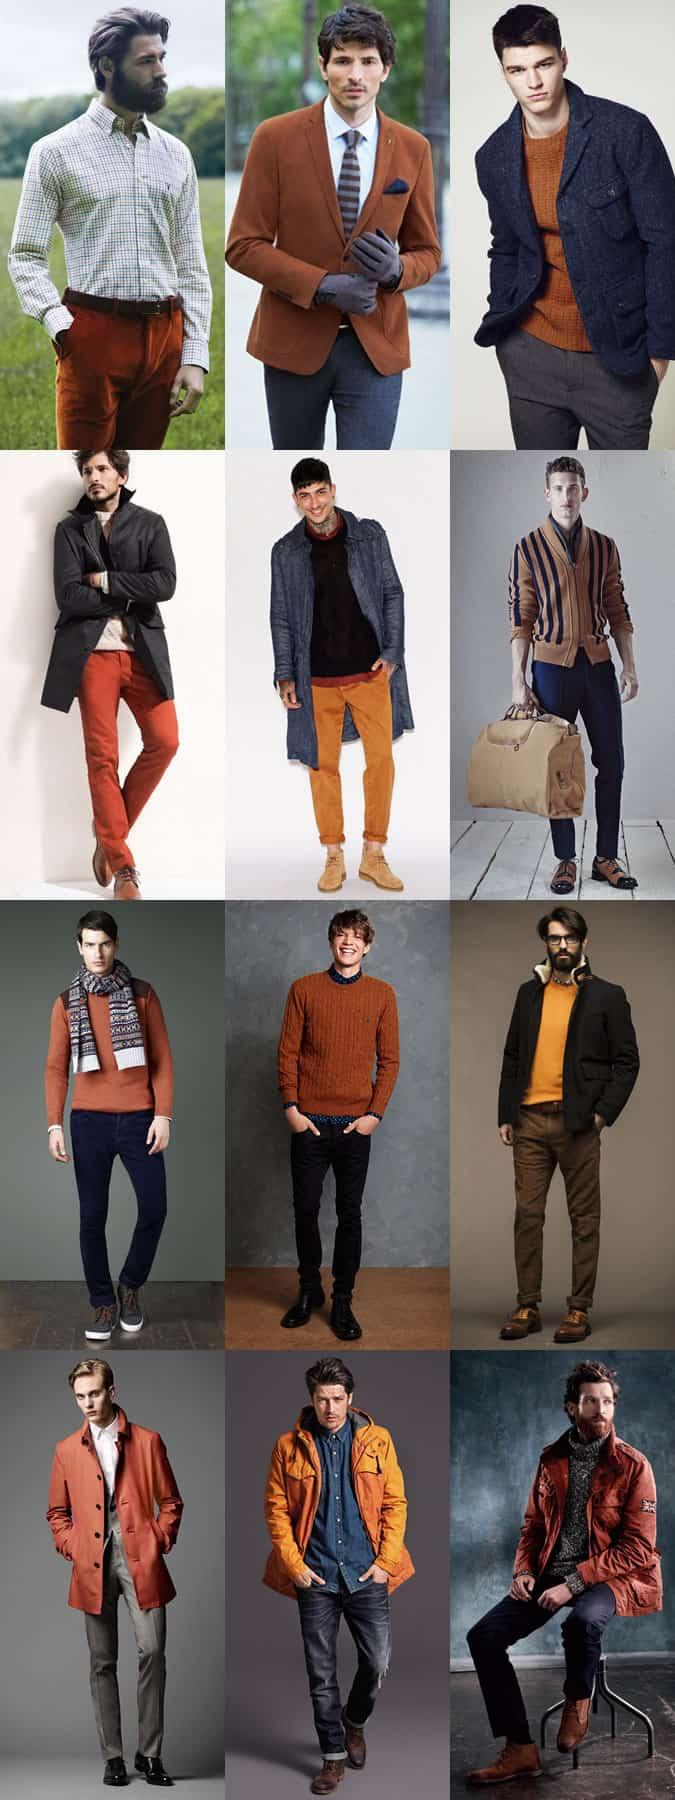 Men's Orange Outfit Inspiration